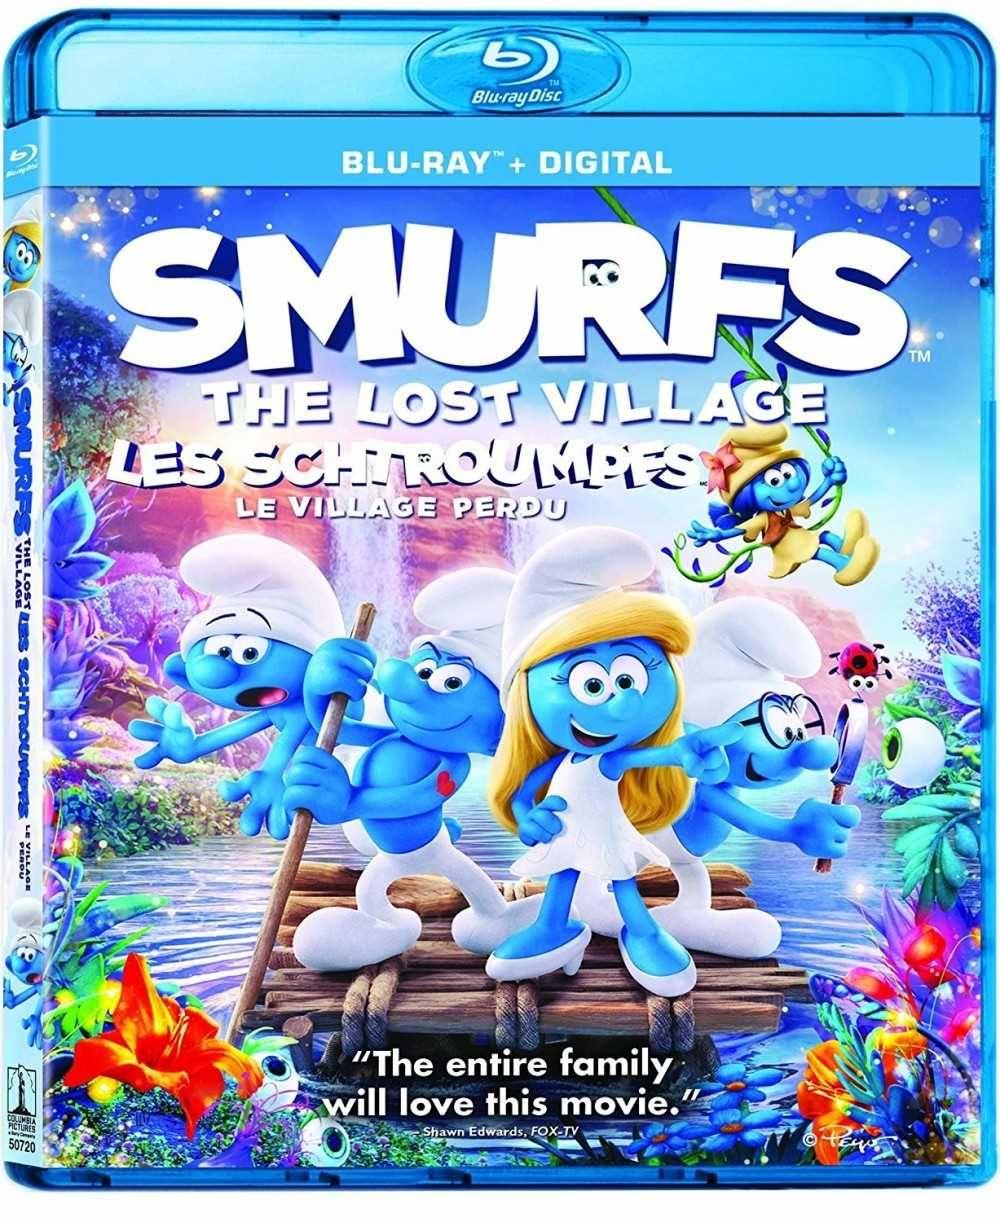 Sirinler 3 Kayip Koy Smurfs The Lost Village Turkce Dublaj 1080p Https Www Efilmindir Org Sirinler 3 Kayip Koy Smurfs The Lost V Pitufos Dvd Bebe Jefazo